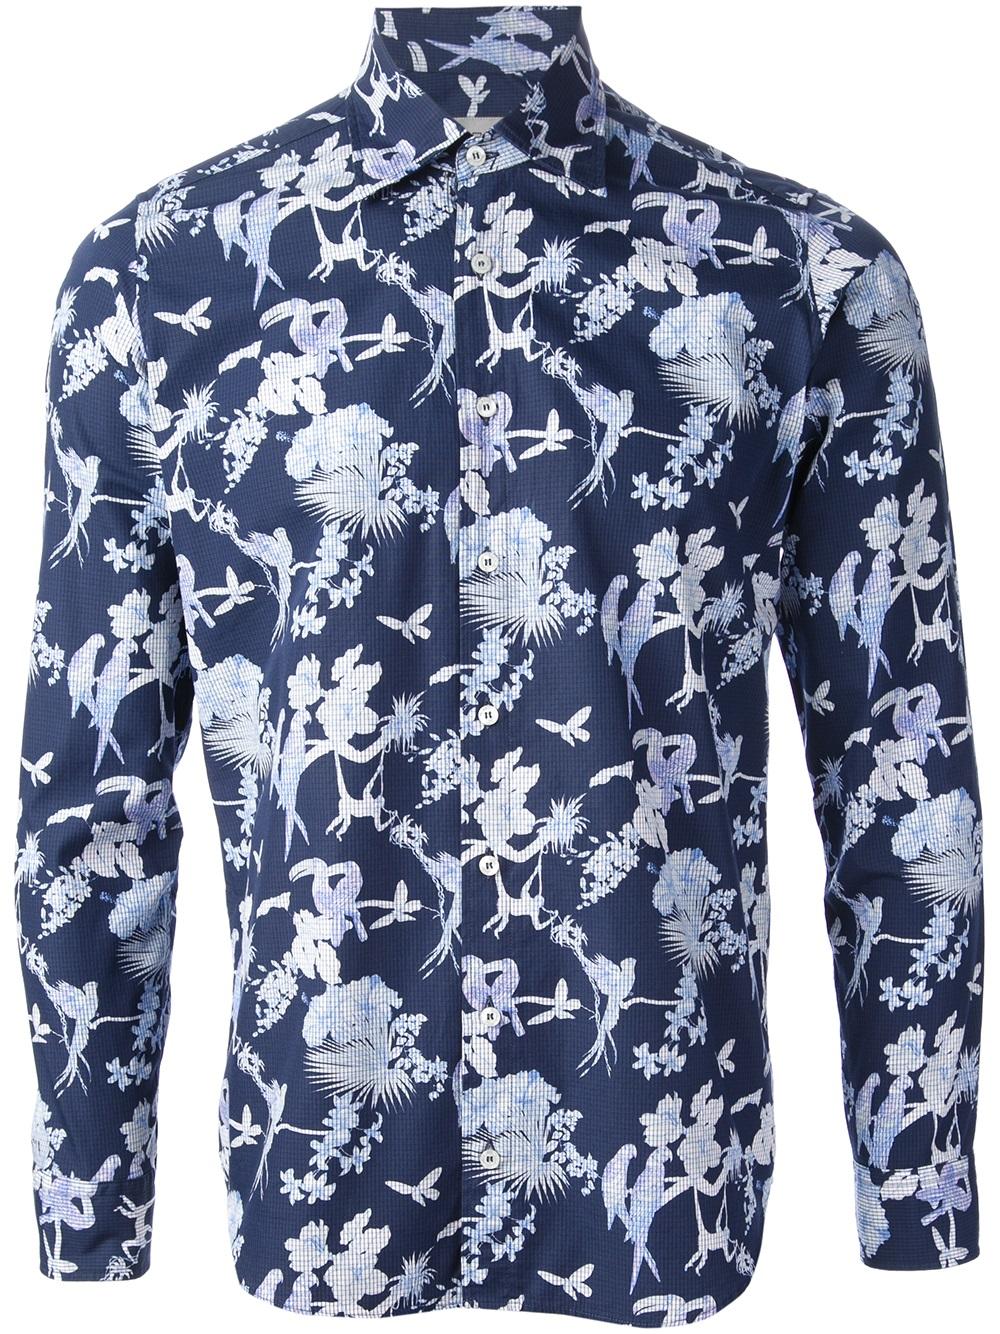 Lyst etro bird print shirt in blue for men for Etro men s shirts